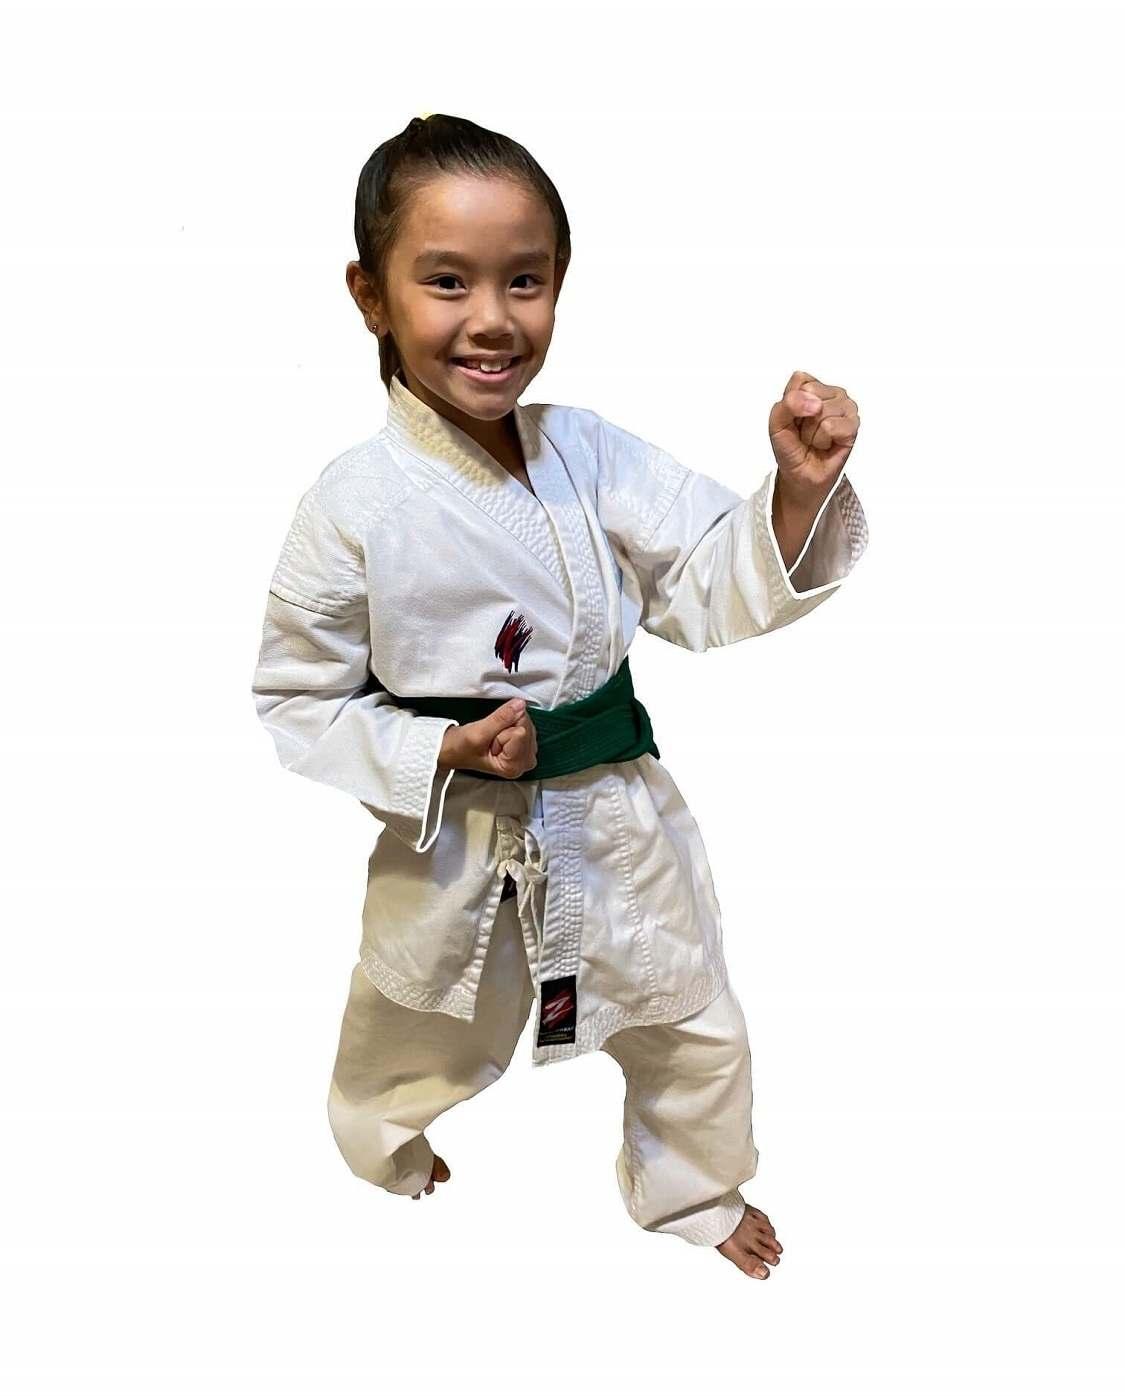 Webp.net Resizeimage, Warrior Martial Arts in Madisonville, KY